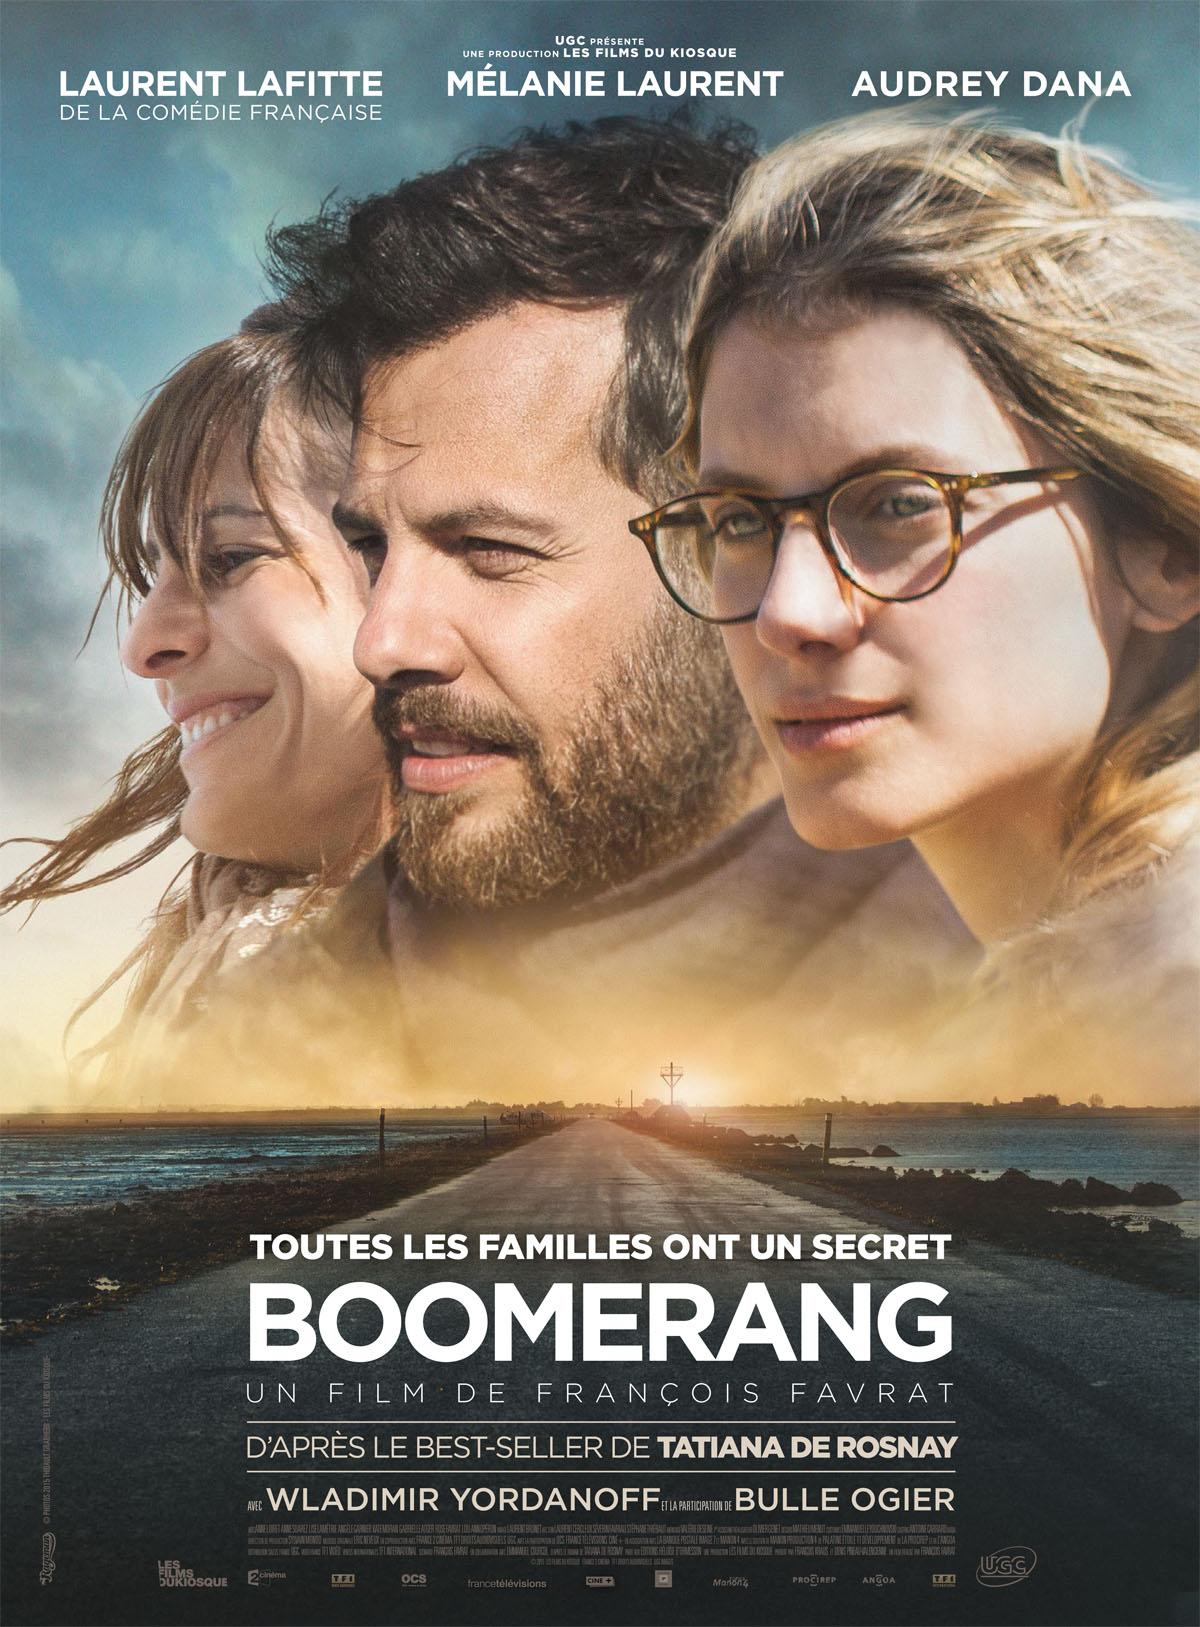 Boomerang (2015) affiche